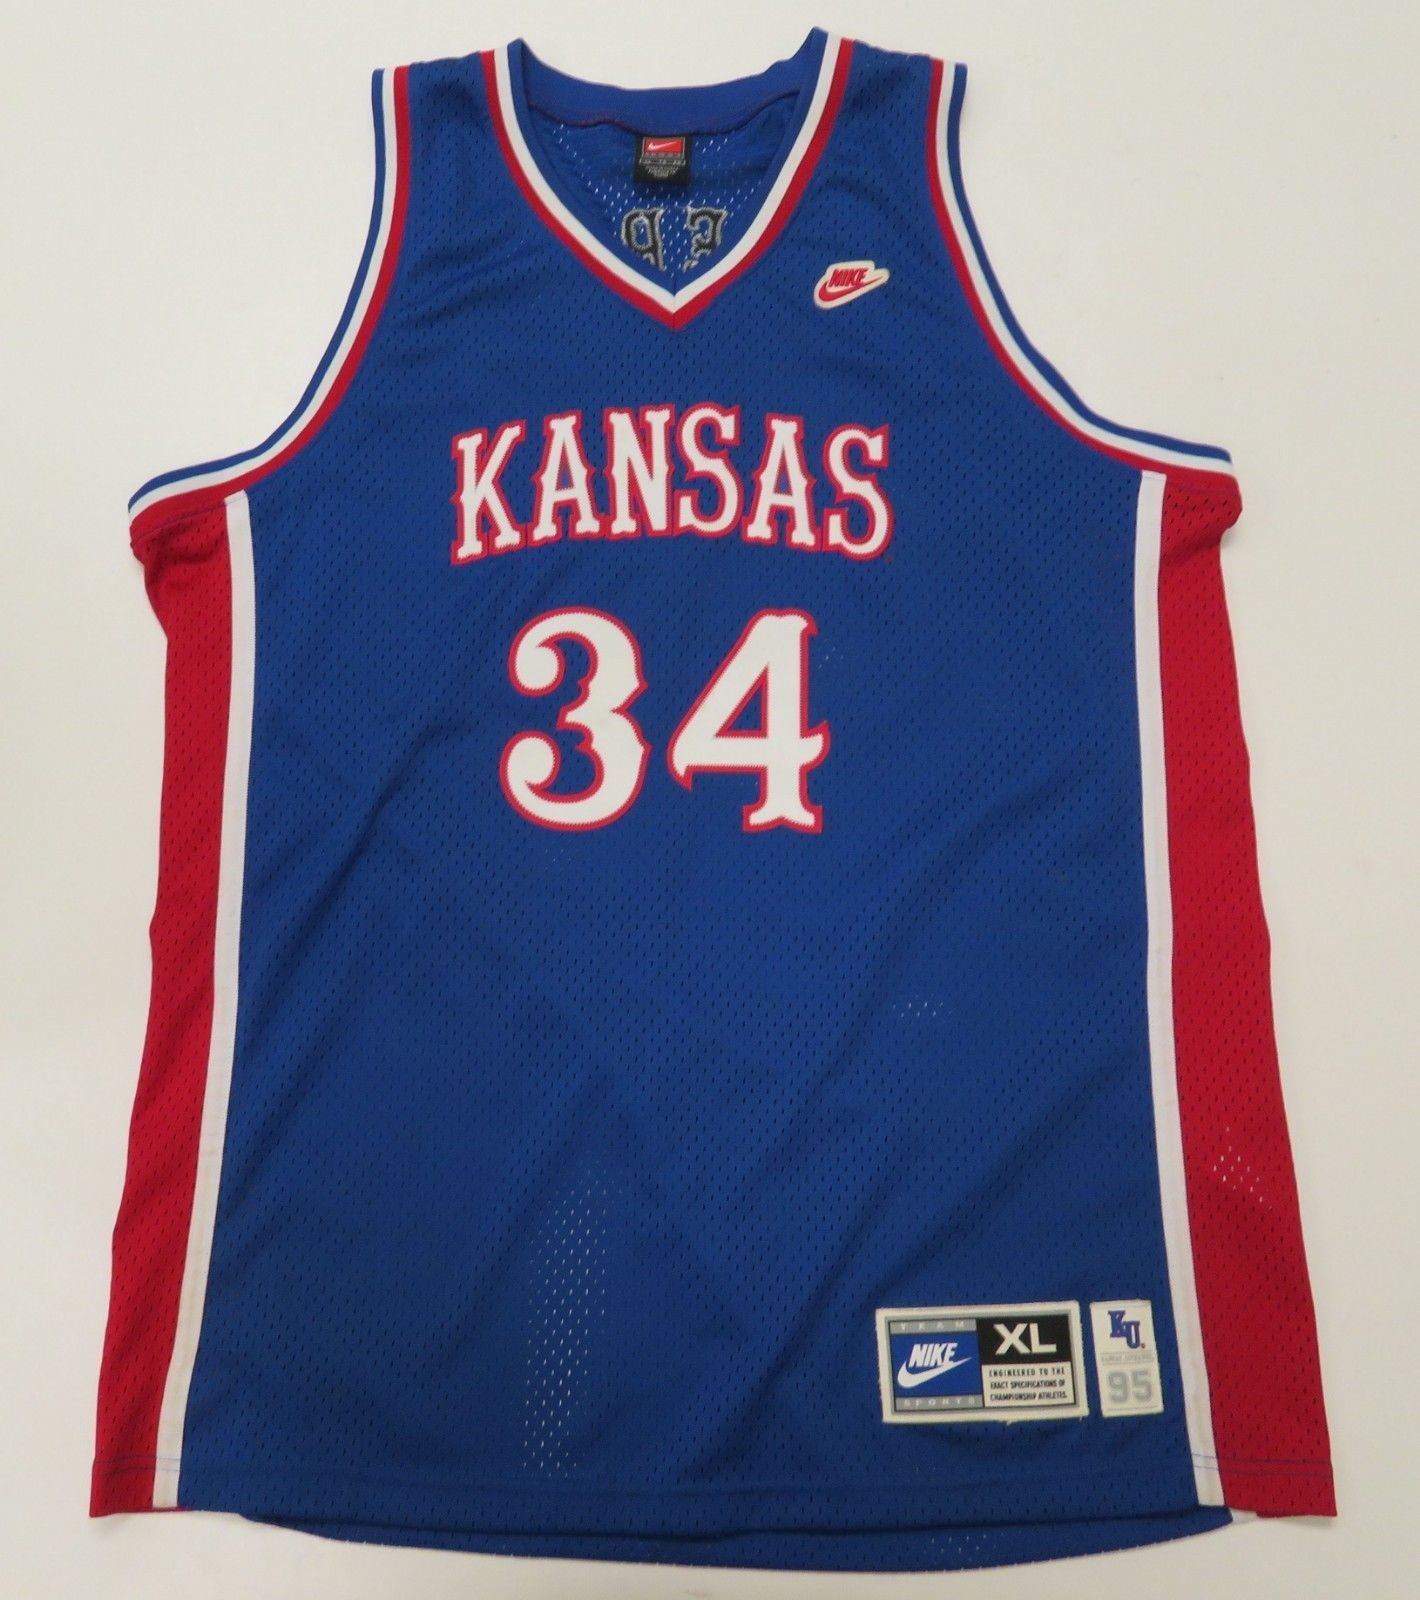 Nike VTG Basketball Jersey Kansas Jayhawks and 50 similar items. S l1600 a6eb8bb0b